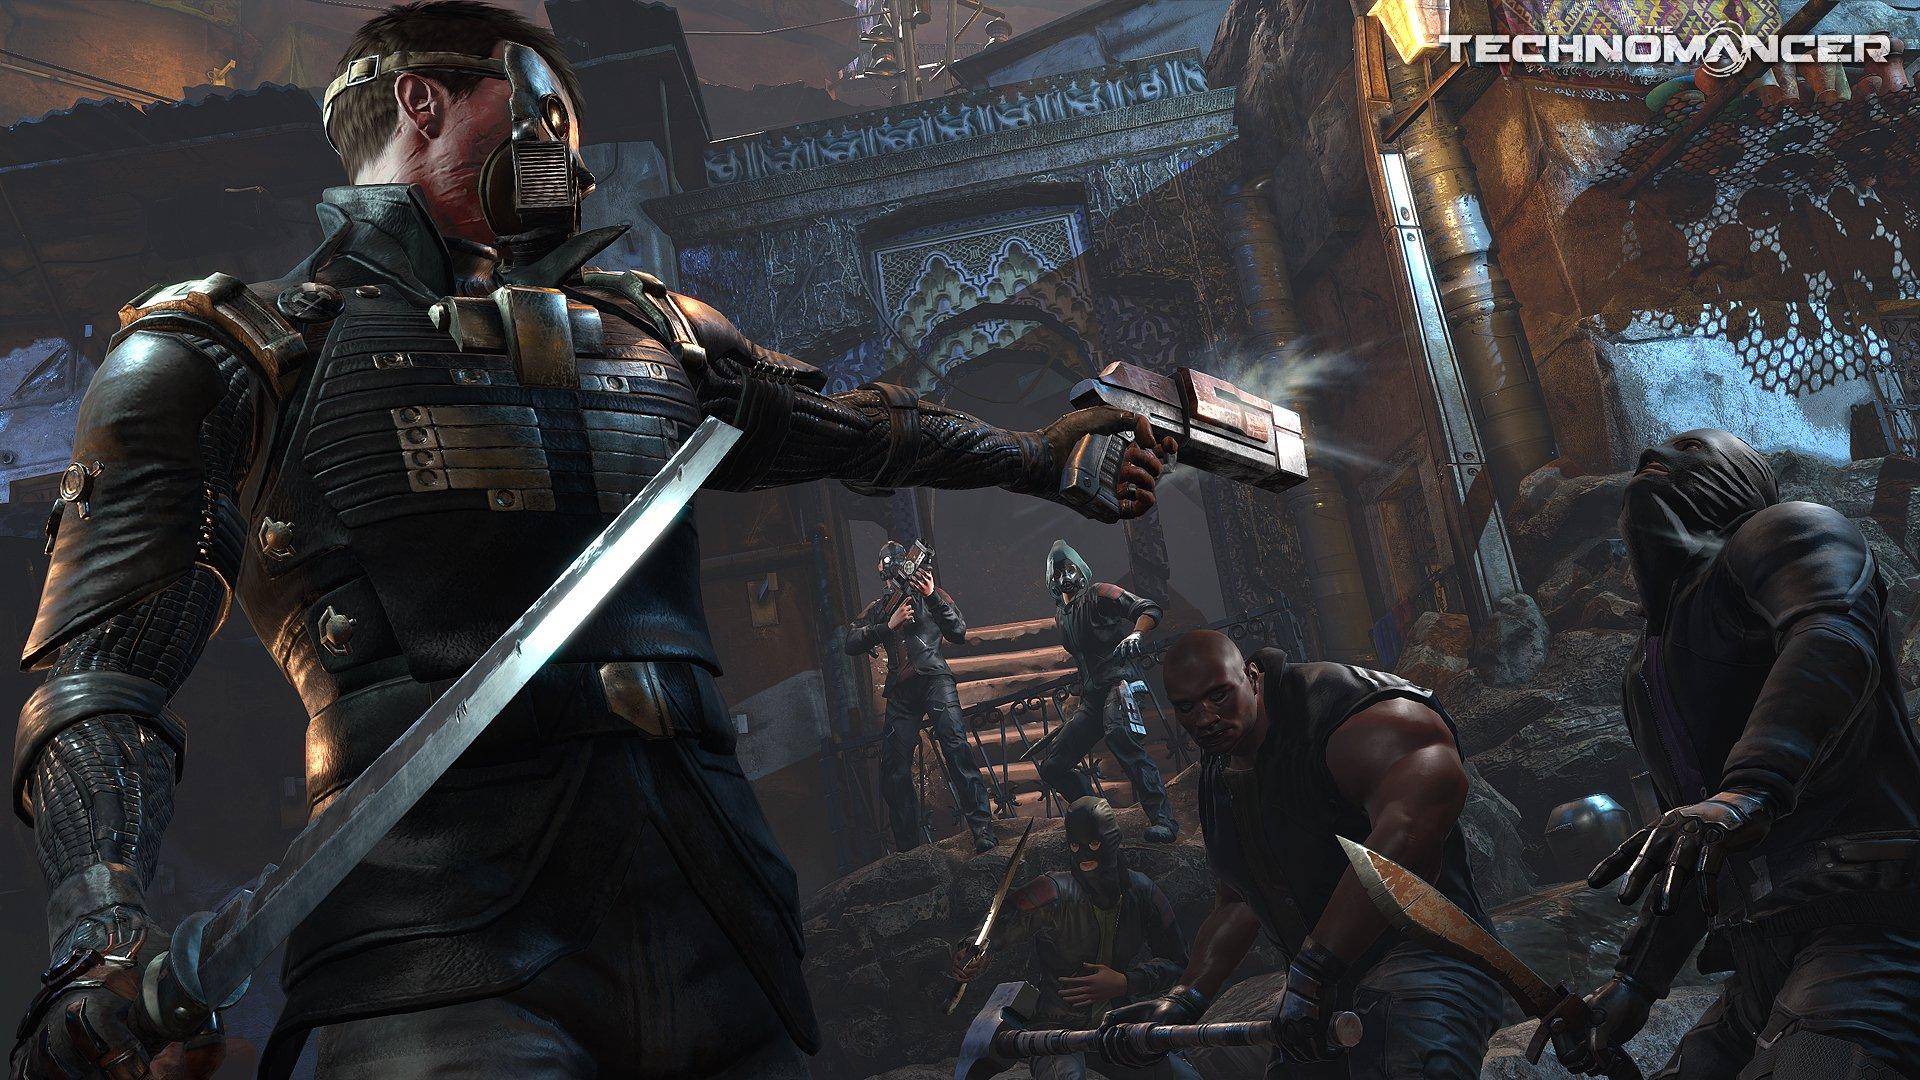 The Technomancer Screenshots ~ PS4, Xbox One & PC. - Изображение 2